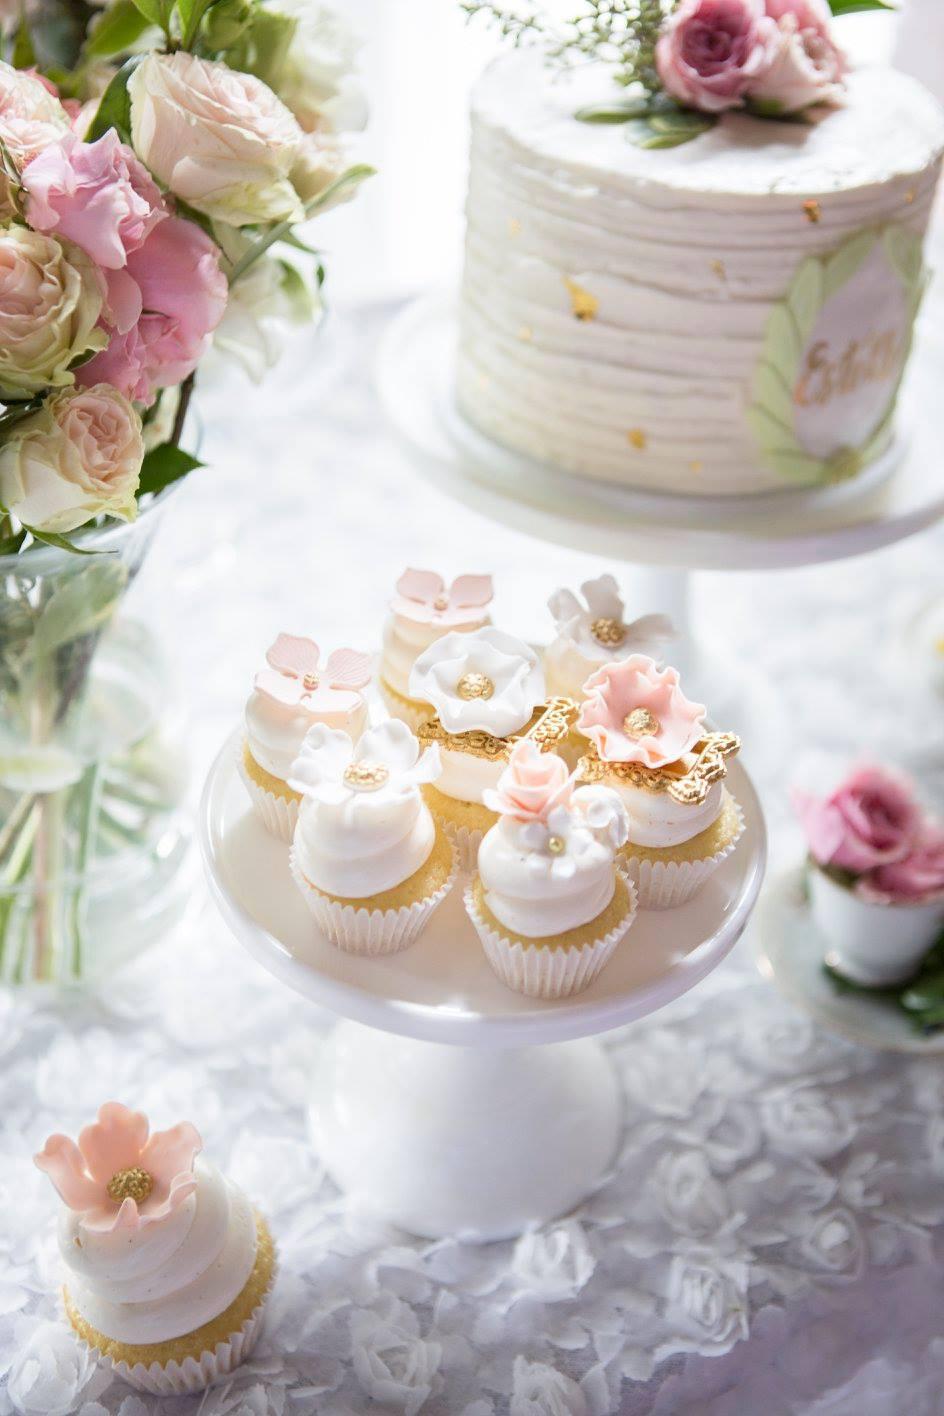 Secret Garden First Birthday Party- Korean first birthday dohl dol doljanchi nyc korean event planner cupcakes cakepops smash cake birthday cake.jpg